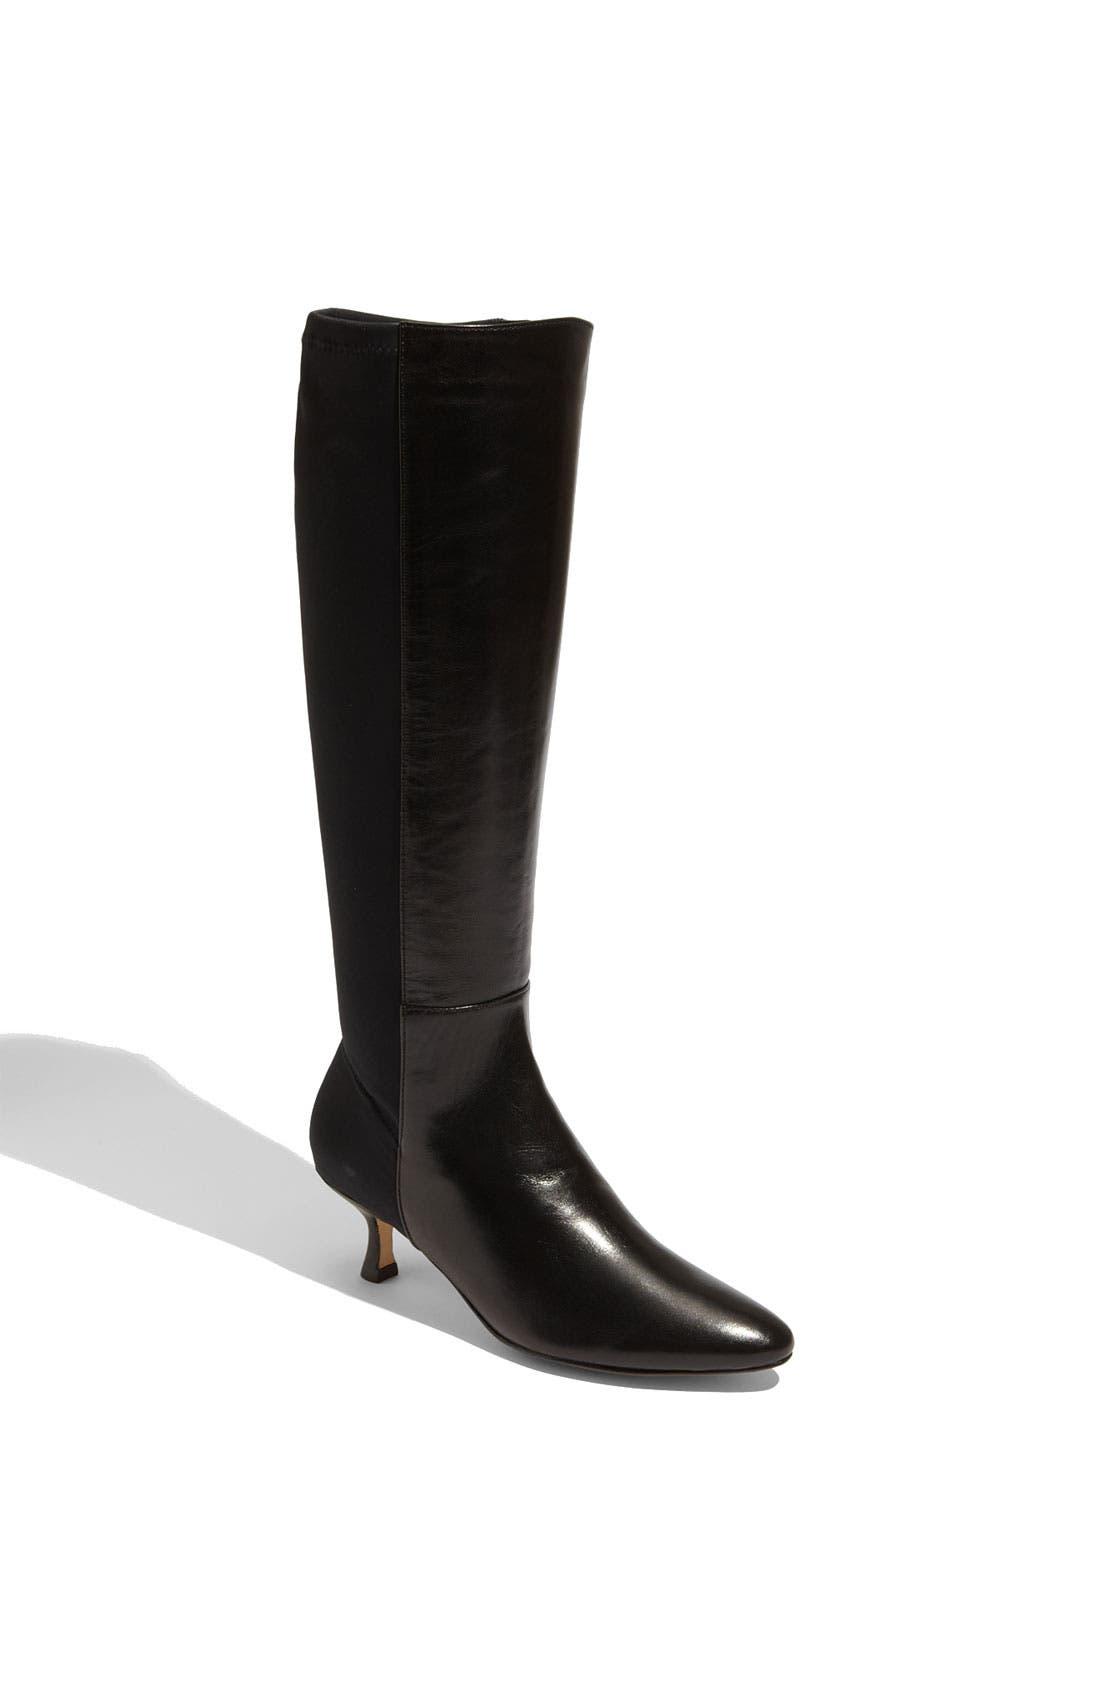 Alternate Image 1 Selected - VANELi 'Eanna' Stretch Boot